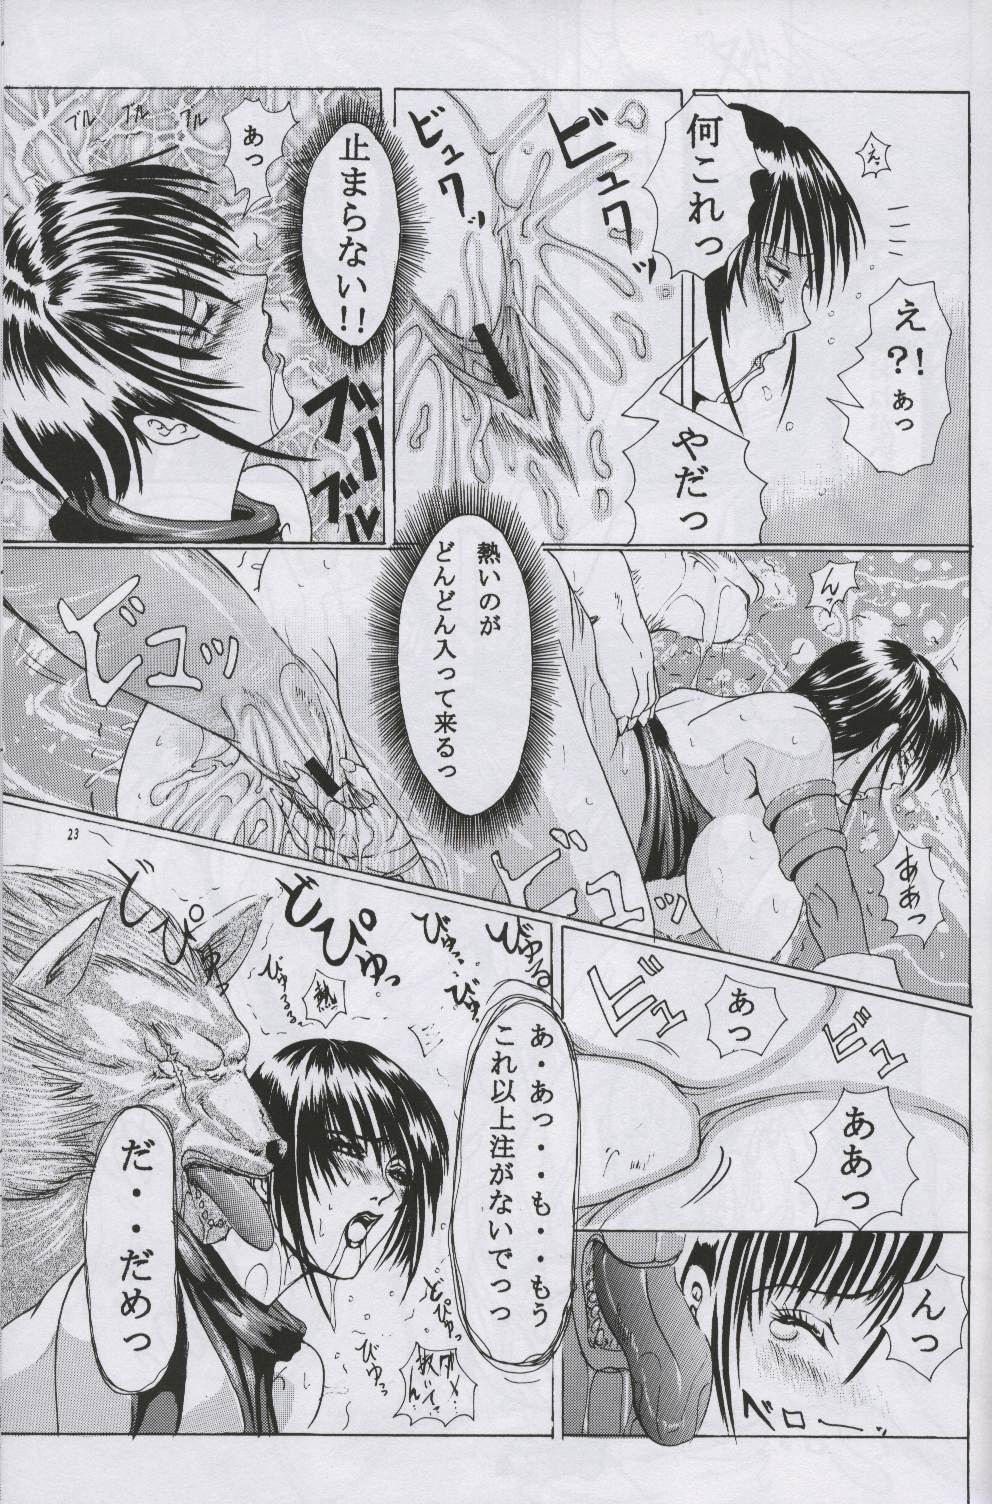 [LUCRETiA (Hiichan)] Ken-Jyuu Retouch Version - Le sexe dur avec l'animal. numero:03 (Samurai Spirits) 20